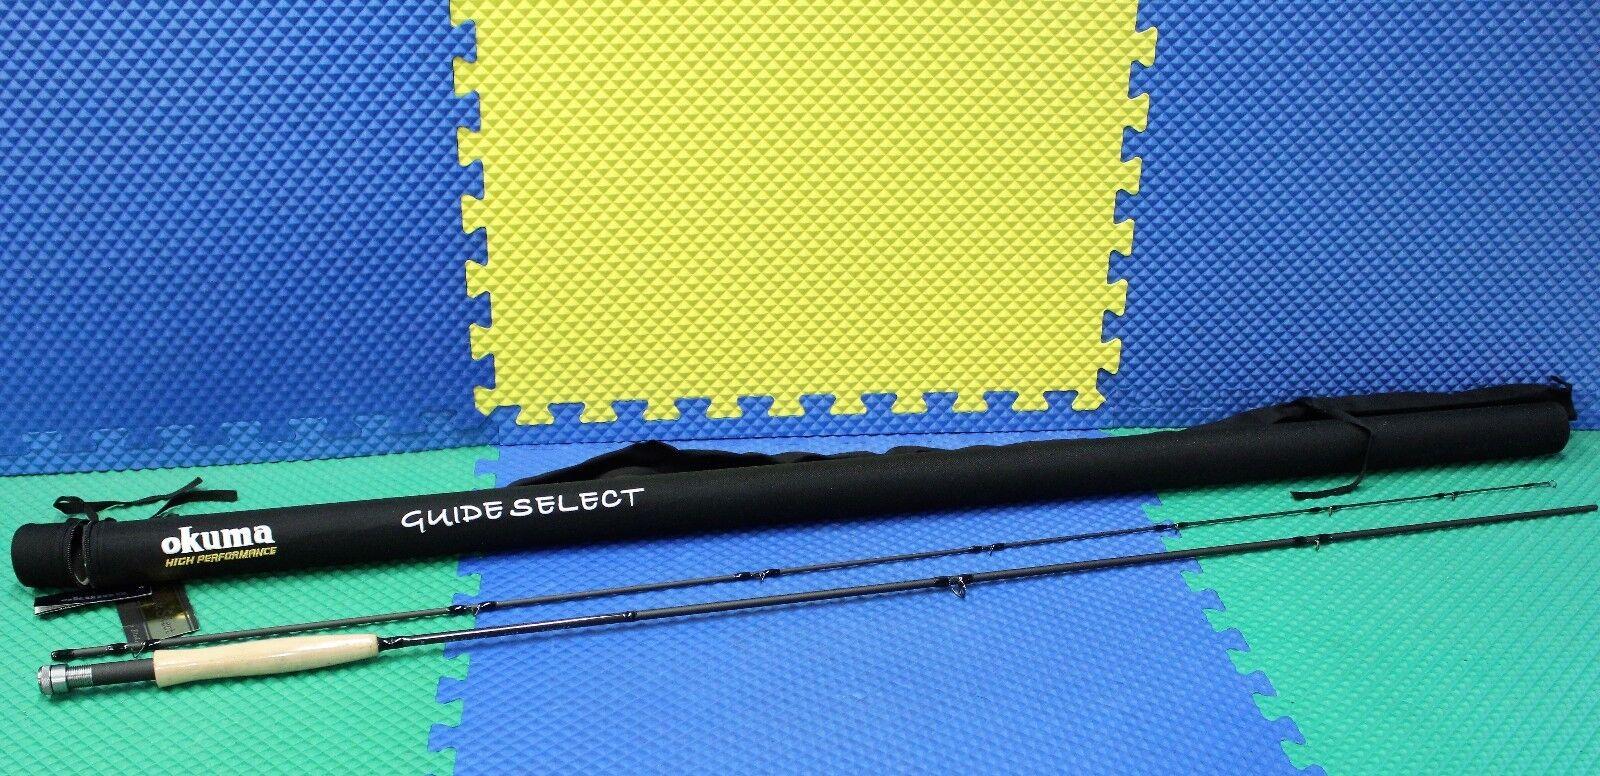 Okuma Guide Select 8' 6 Fly asta Wasta borsa & Hard Tube GSF04862